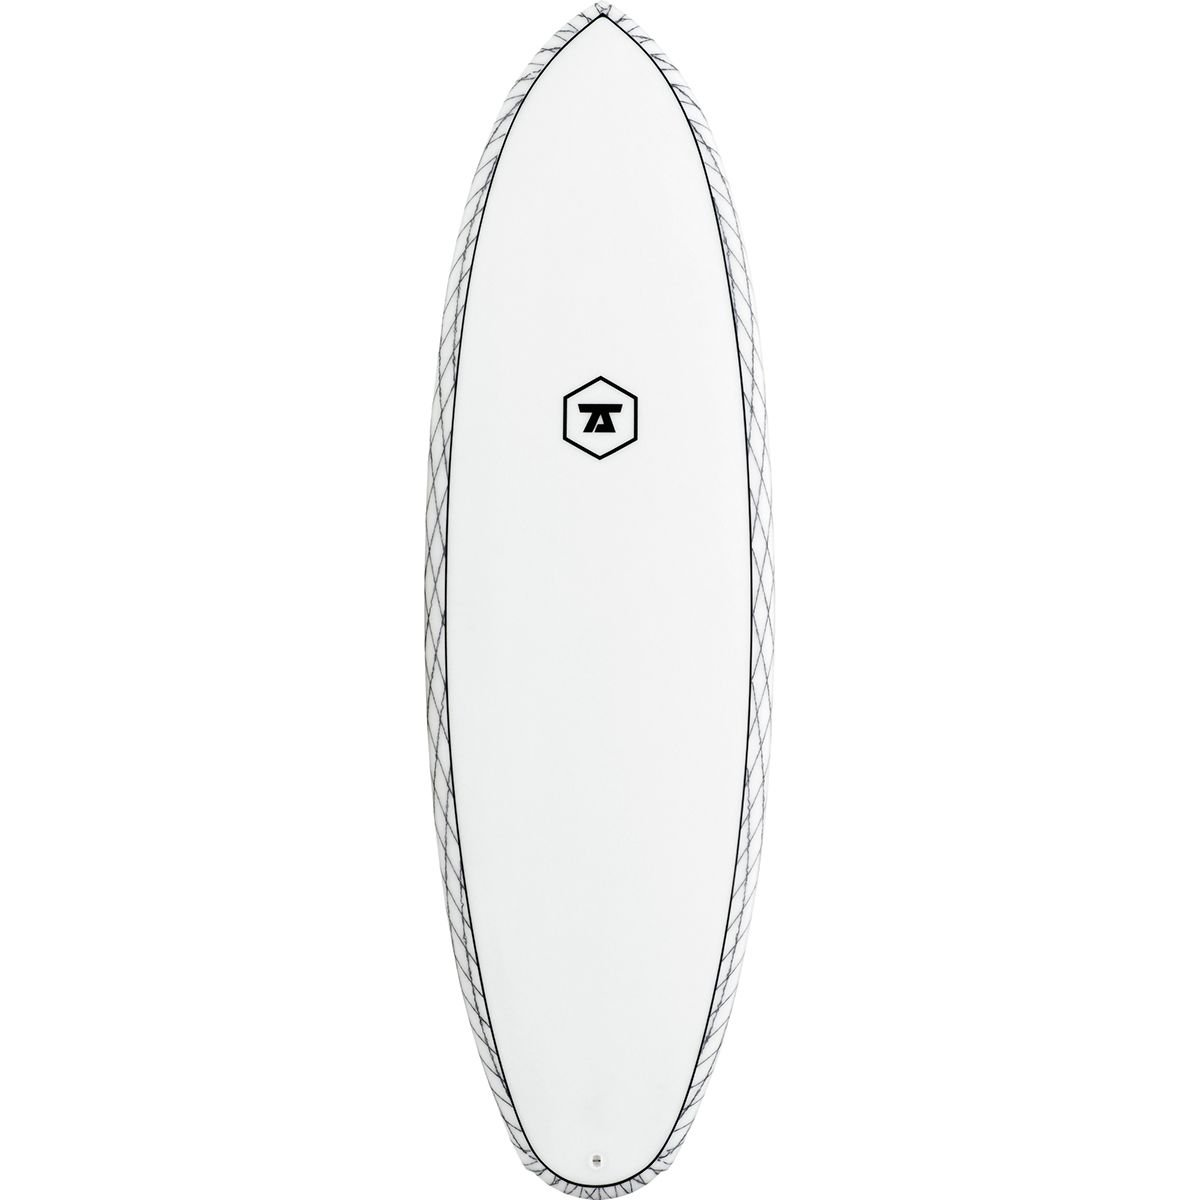 7S Double Down CV Surfboard